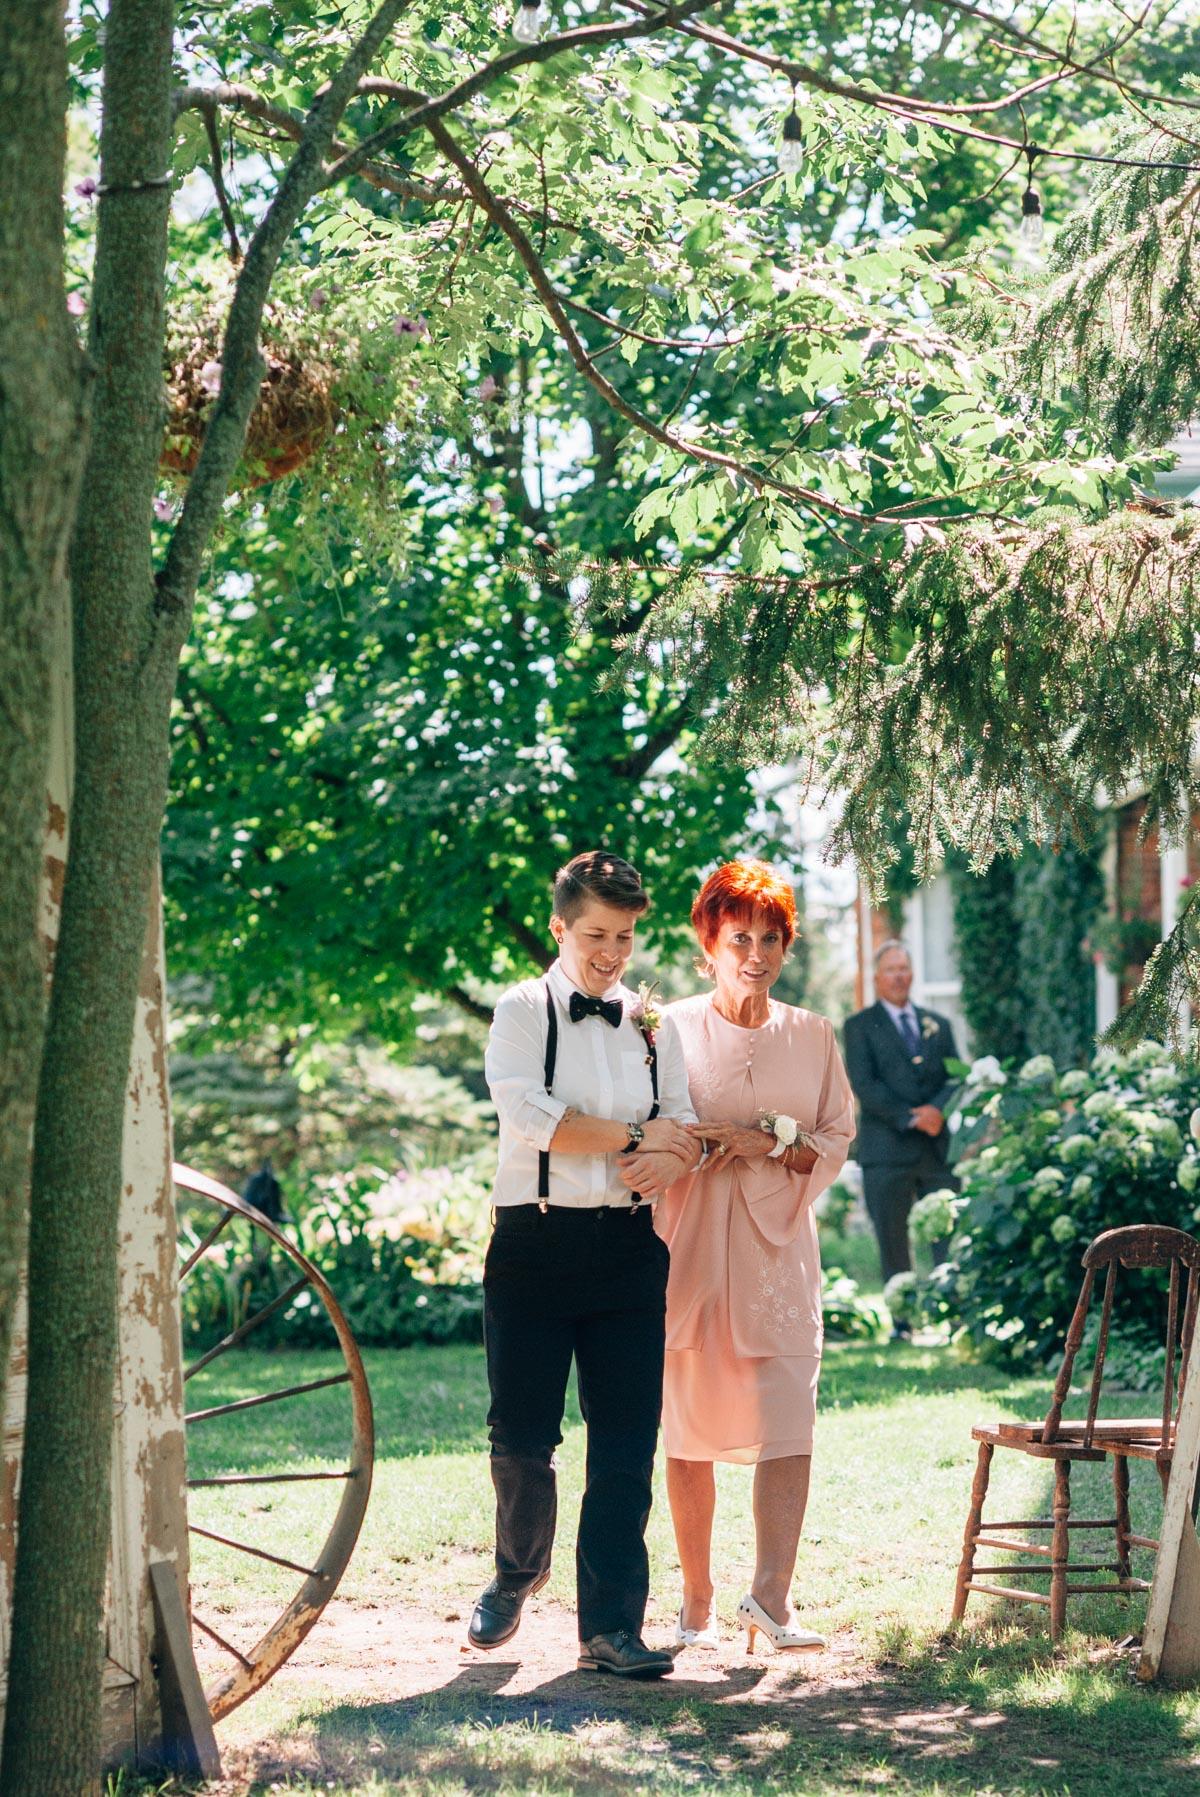 sara-wilde-photography-vineyard-bride-swish-list-beamer-falls-manor-grimsby-wedding-22.jpg